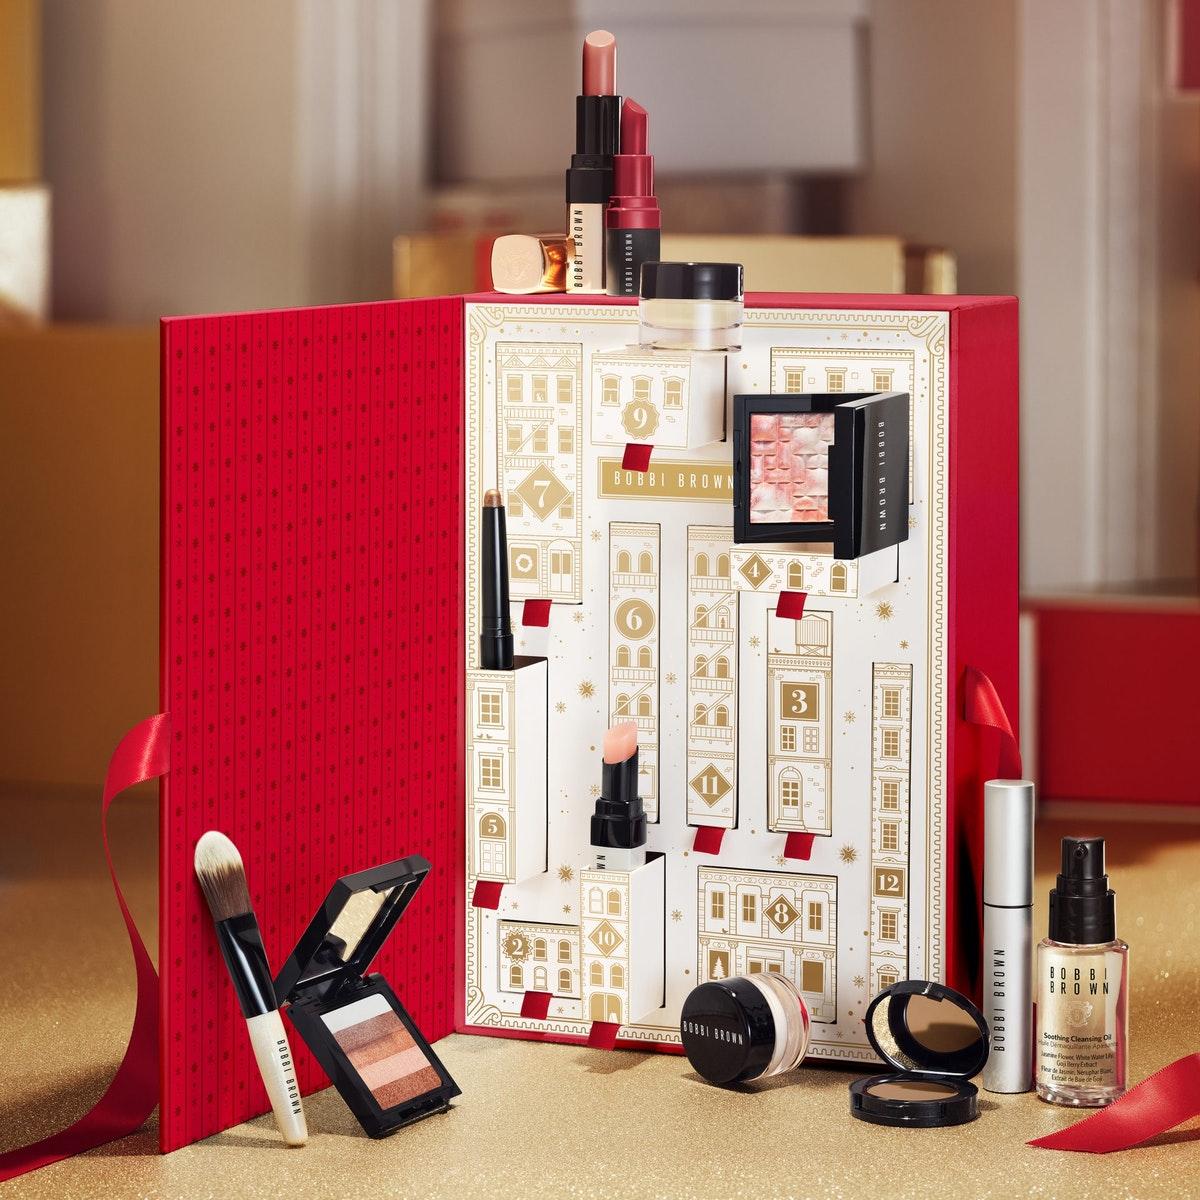 Bobbi Brown Beauty Advent Calendar 2021 Contents Reveal!